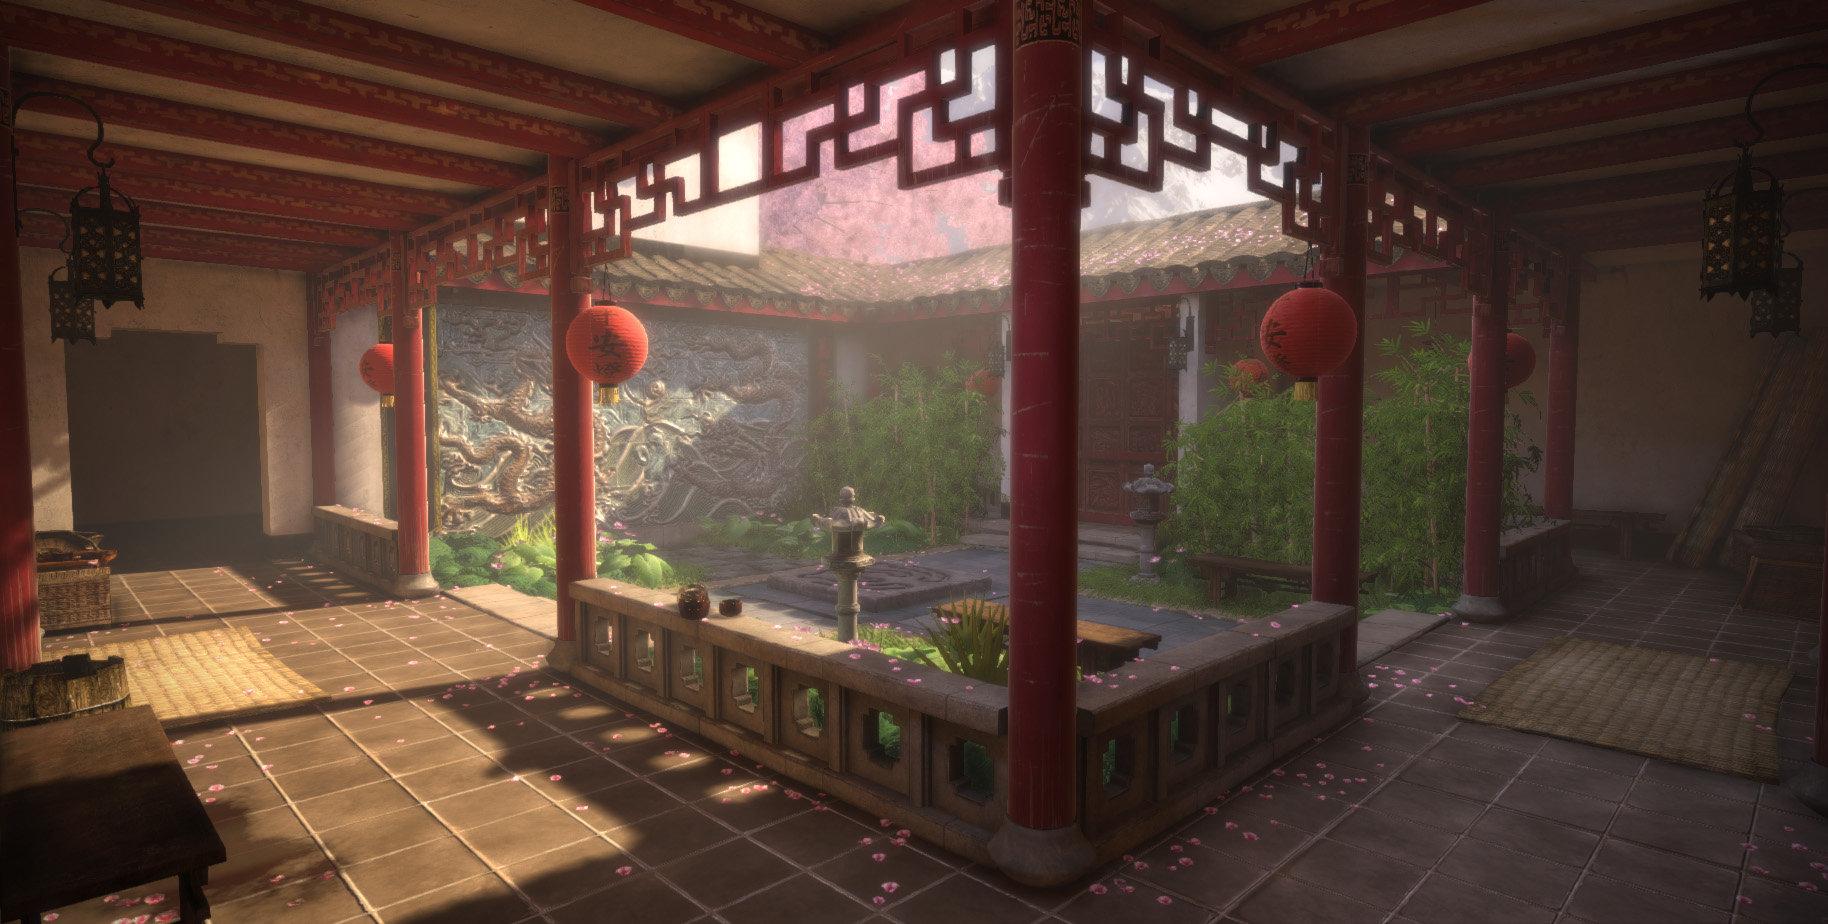 Jeff severson chinese courtyard day 09